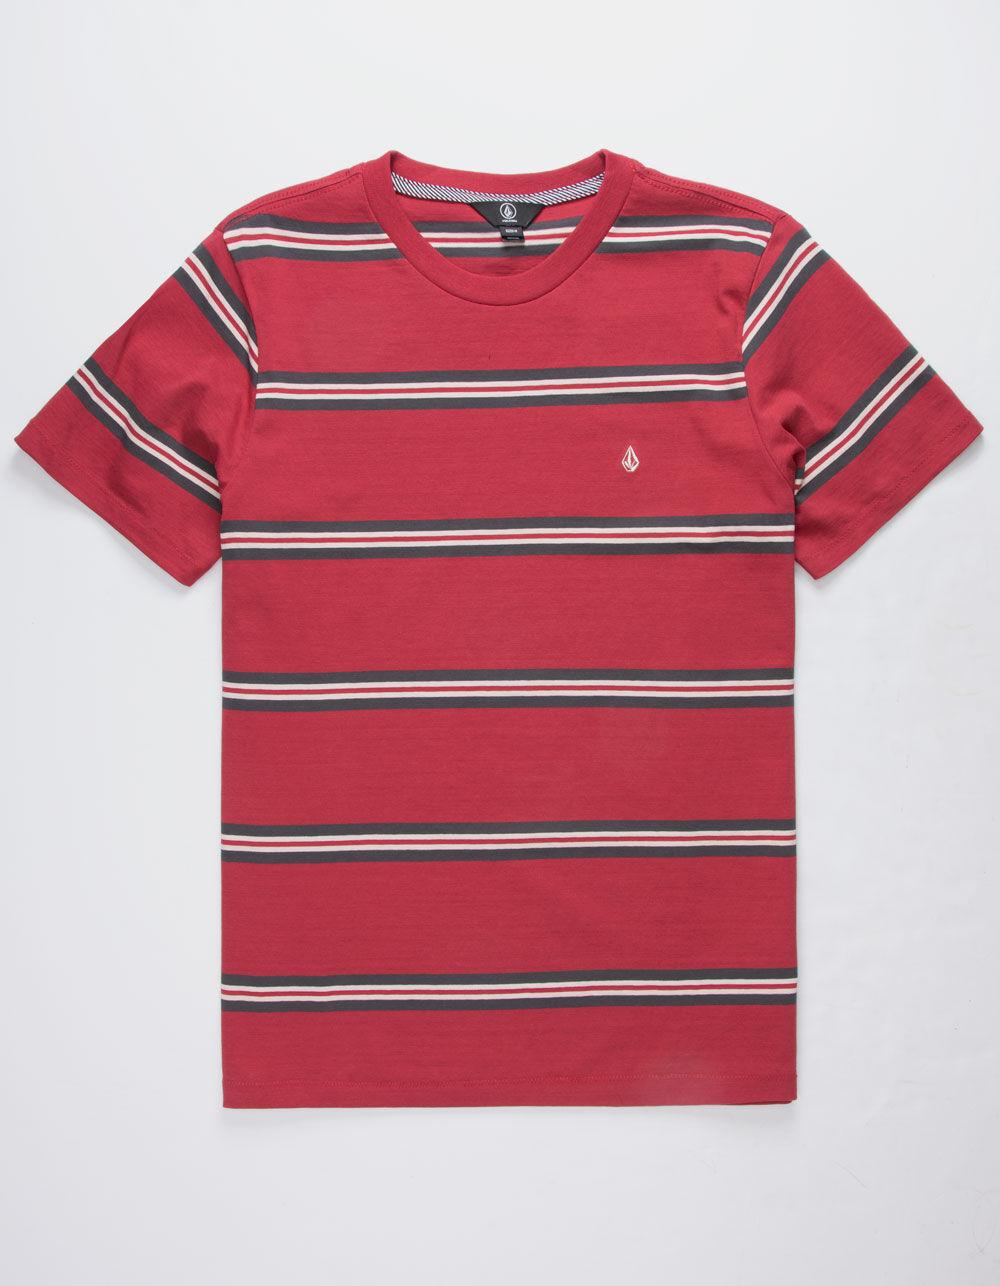 VOLCOM Beauville Burgundy T-Shirt